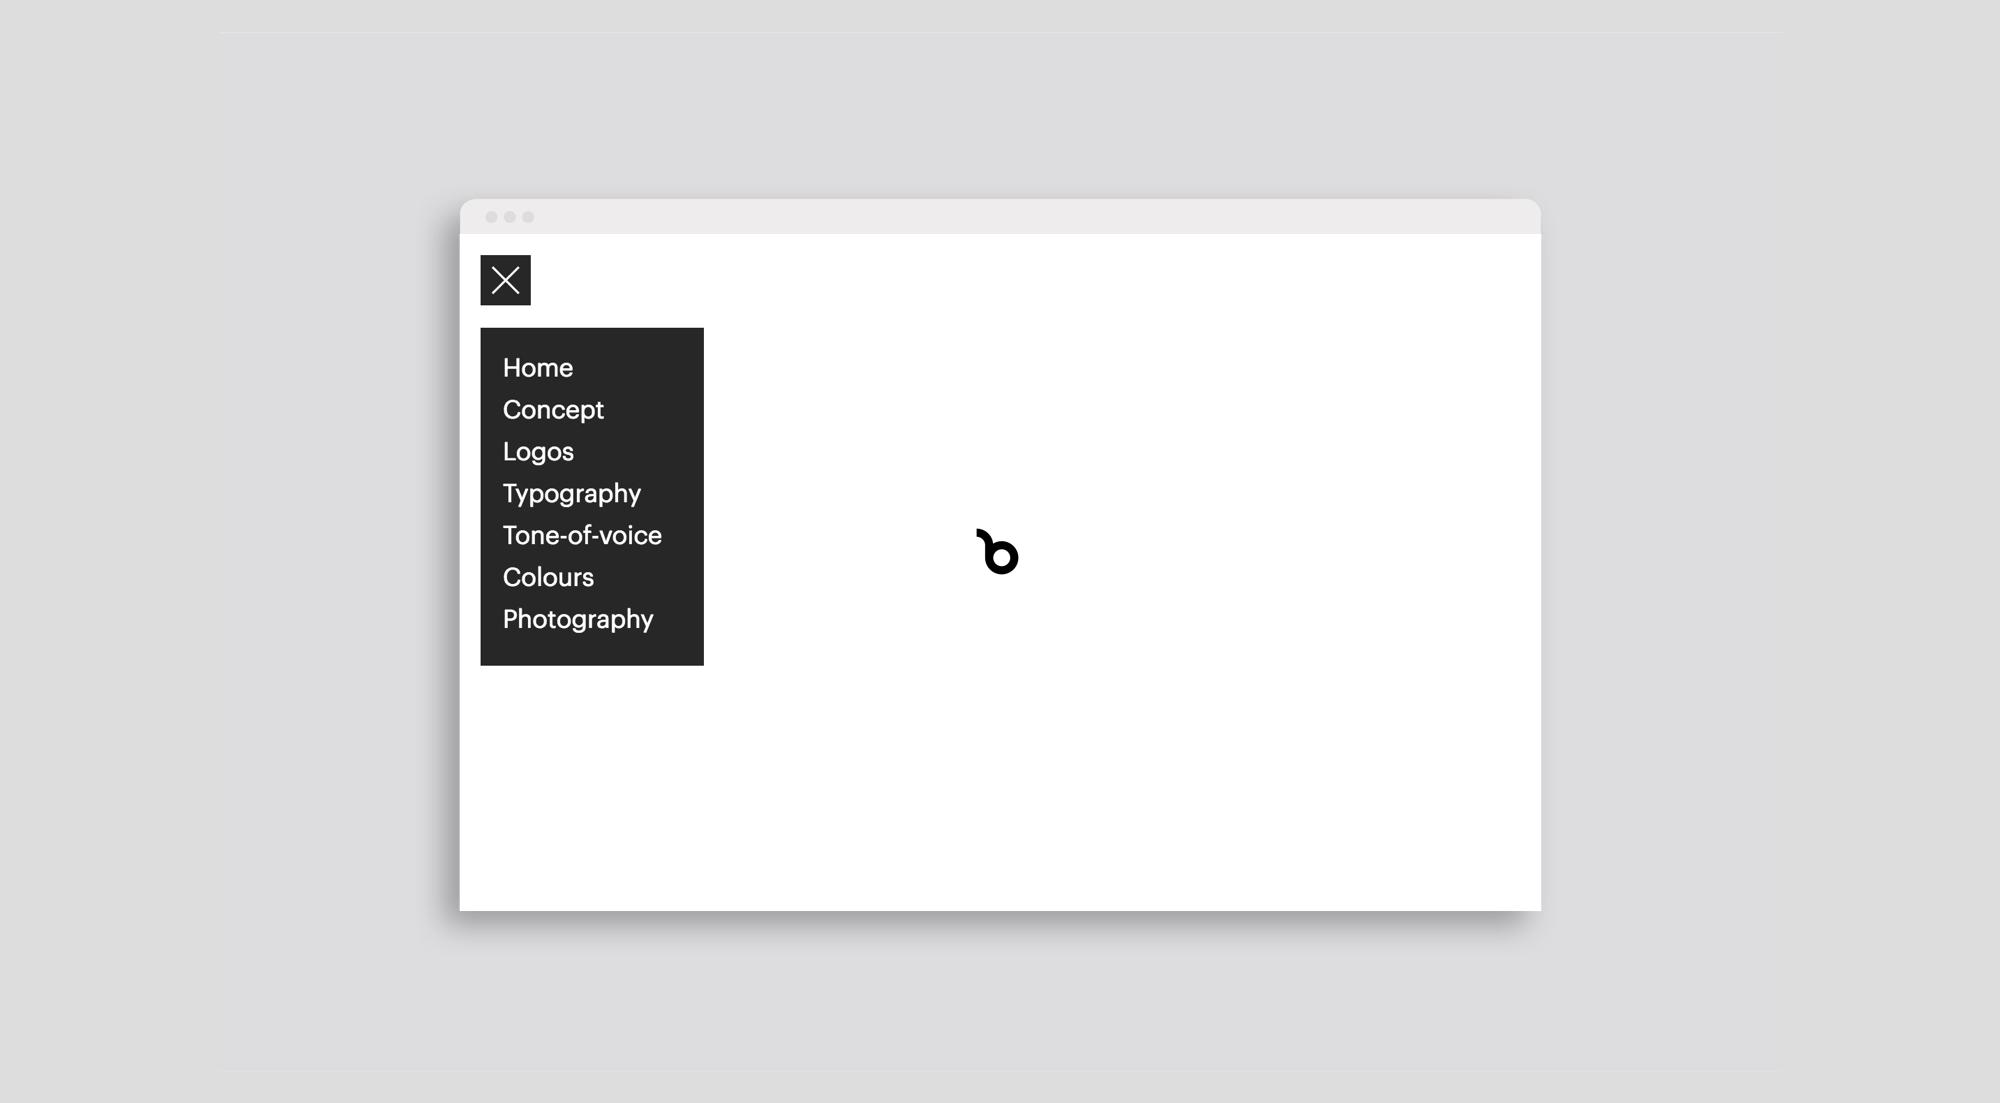 brandpad_navigation